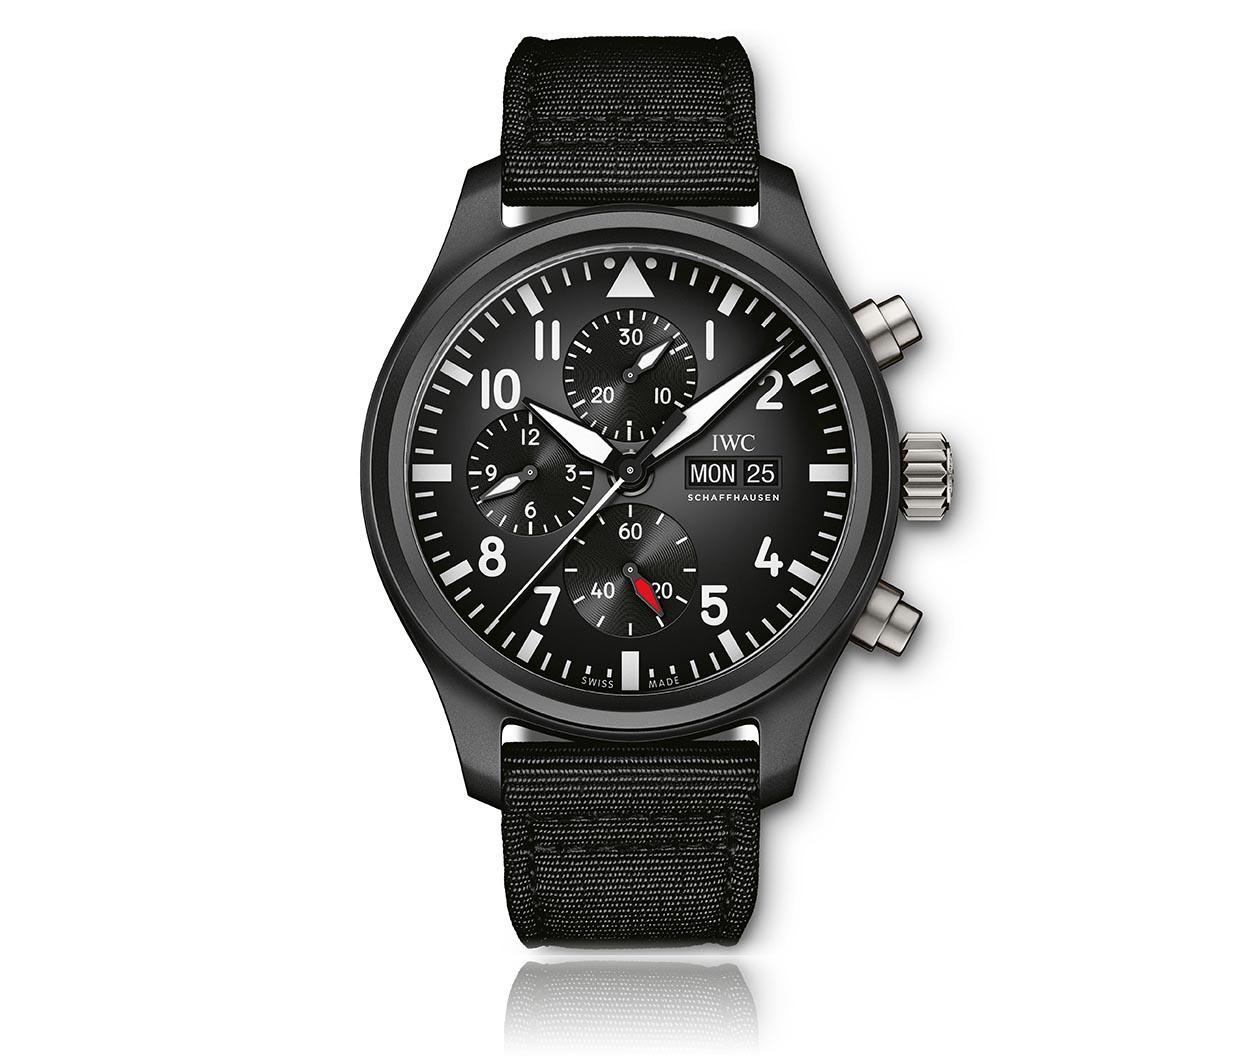 IWC PilotsWatch ChronographTopGun IW389101 Carousel 1 FINAL